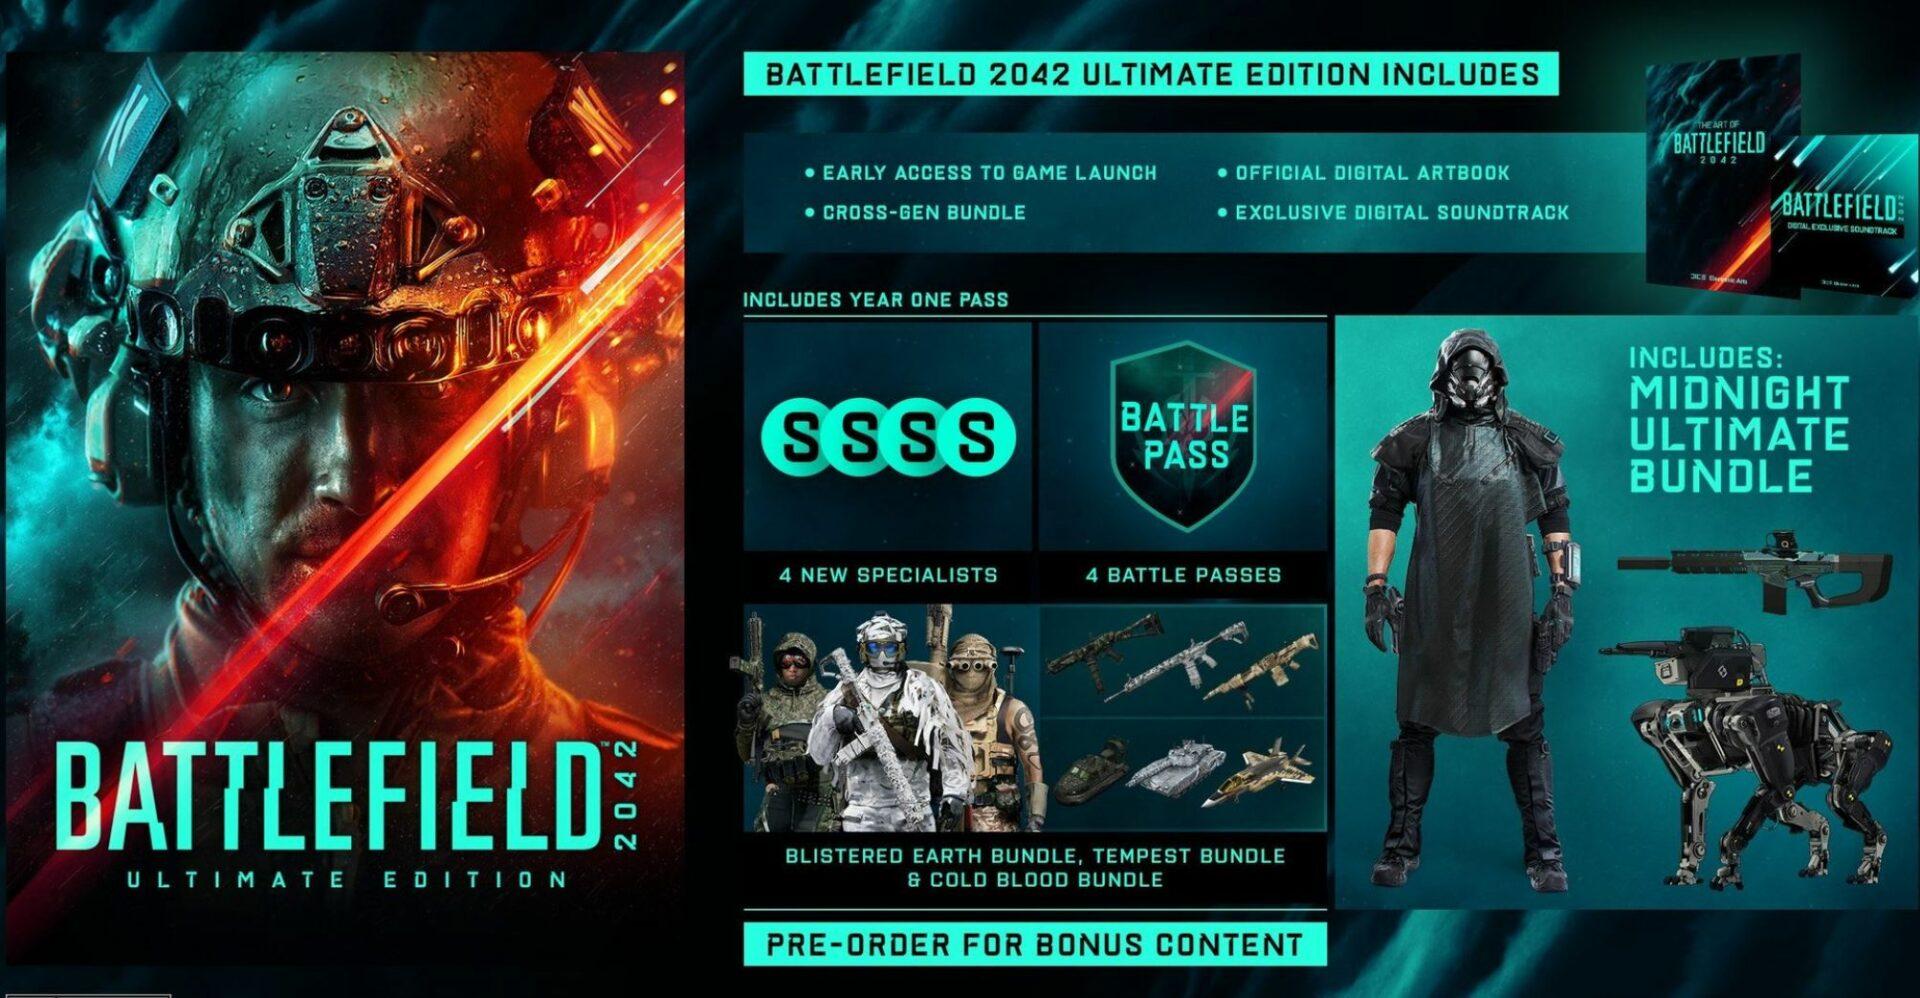 battlefield-2042-ultimate-edition-pre